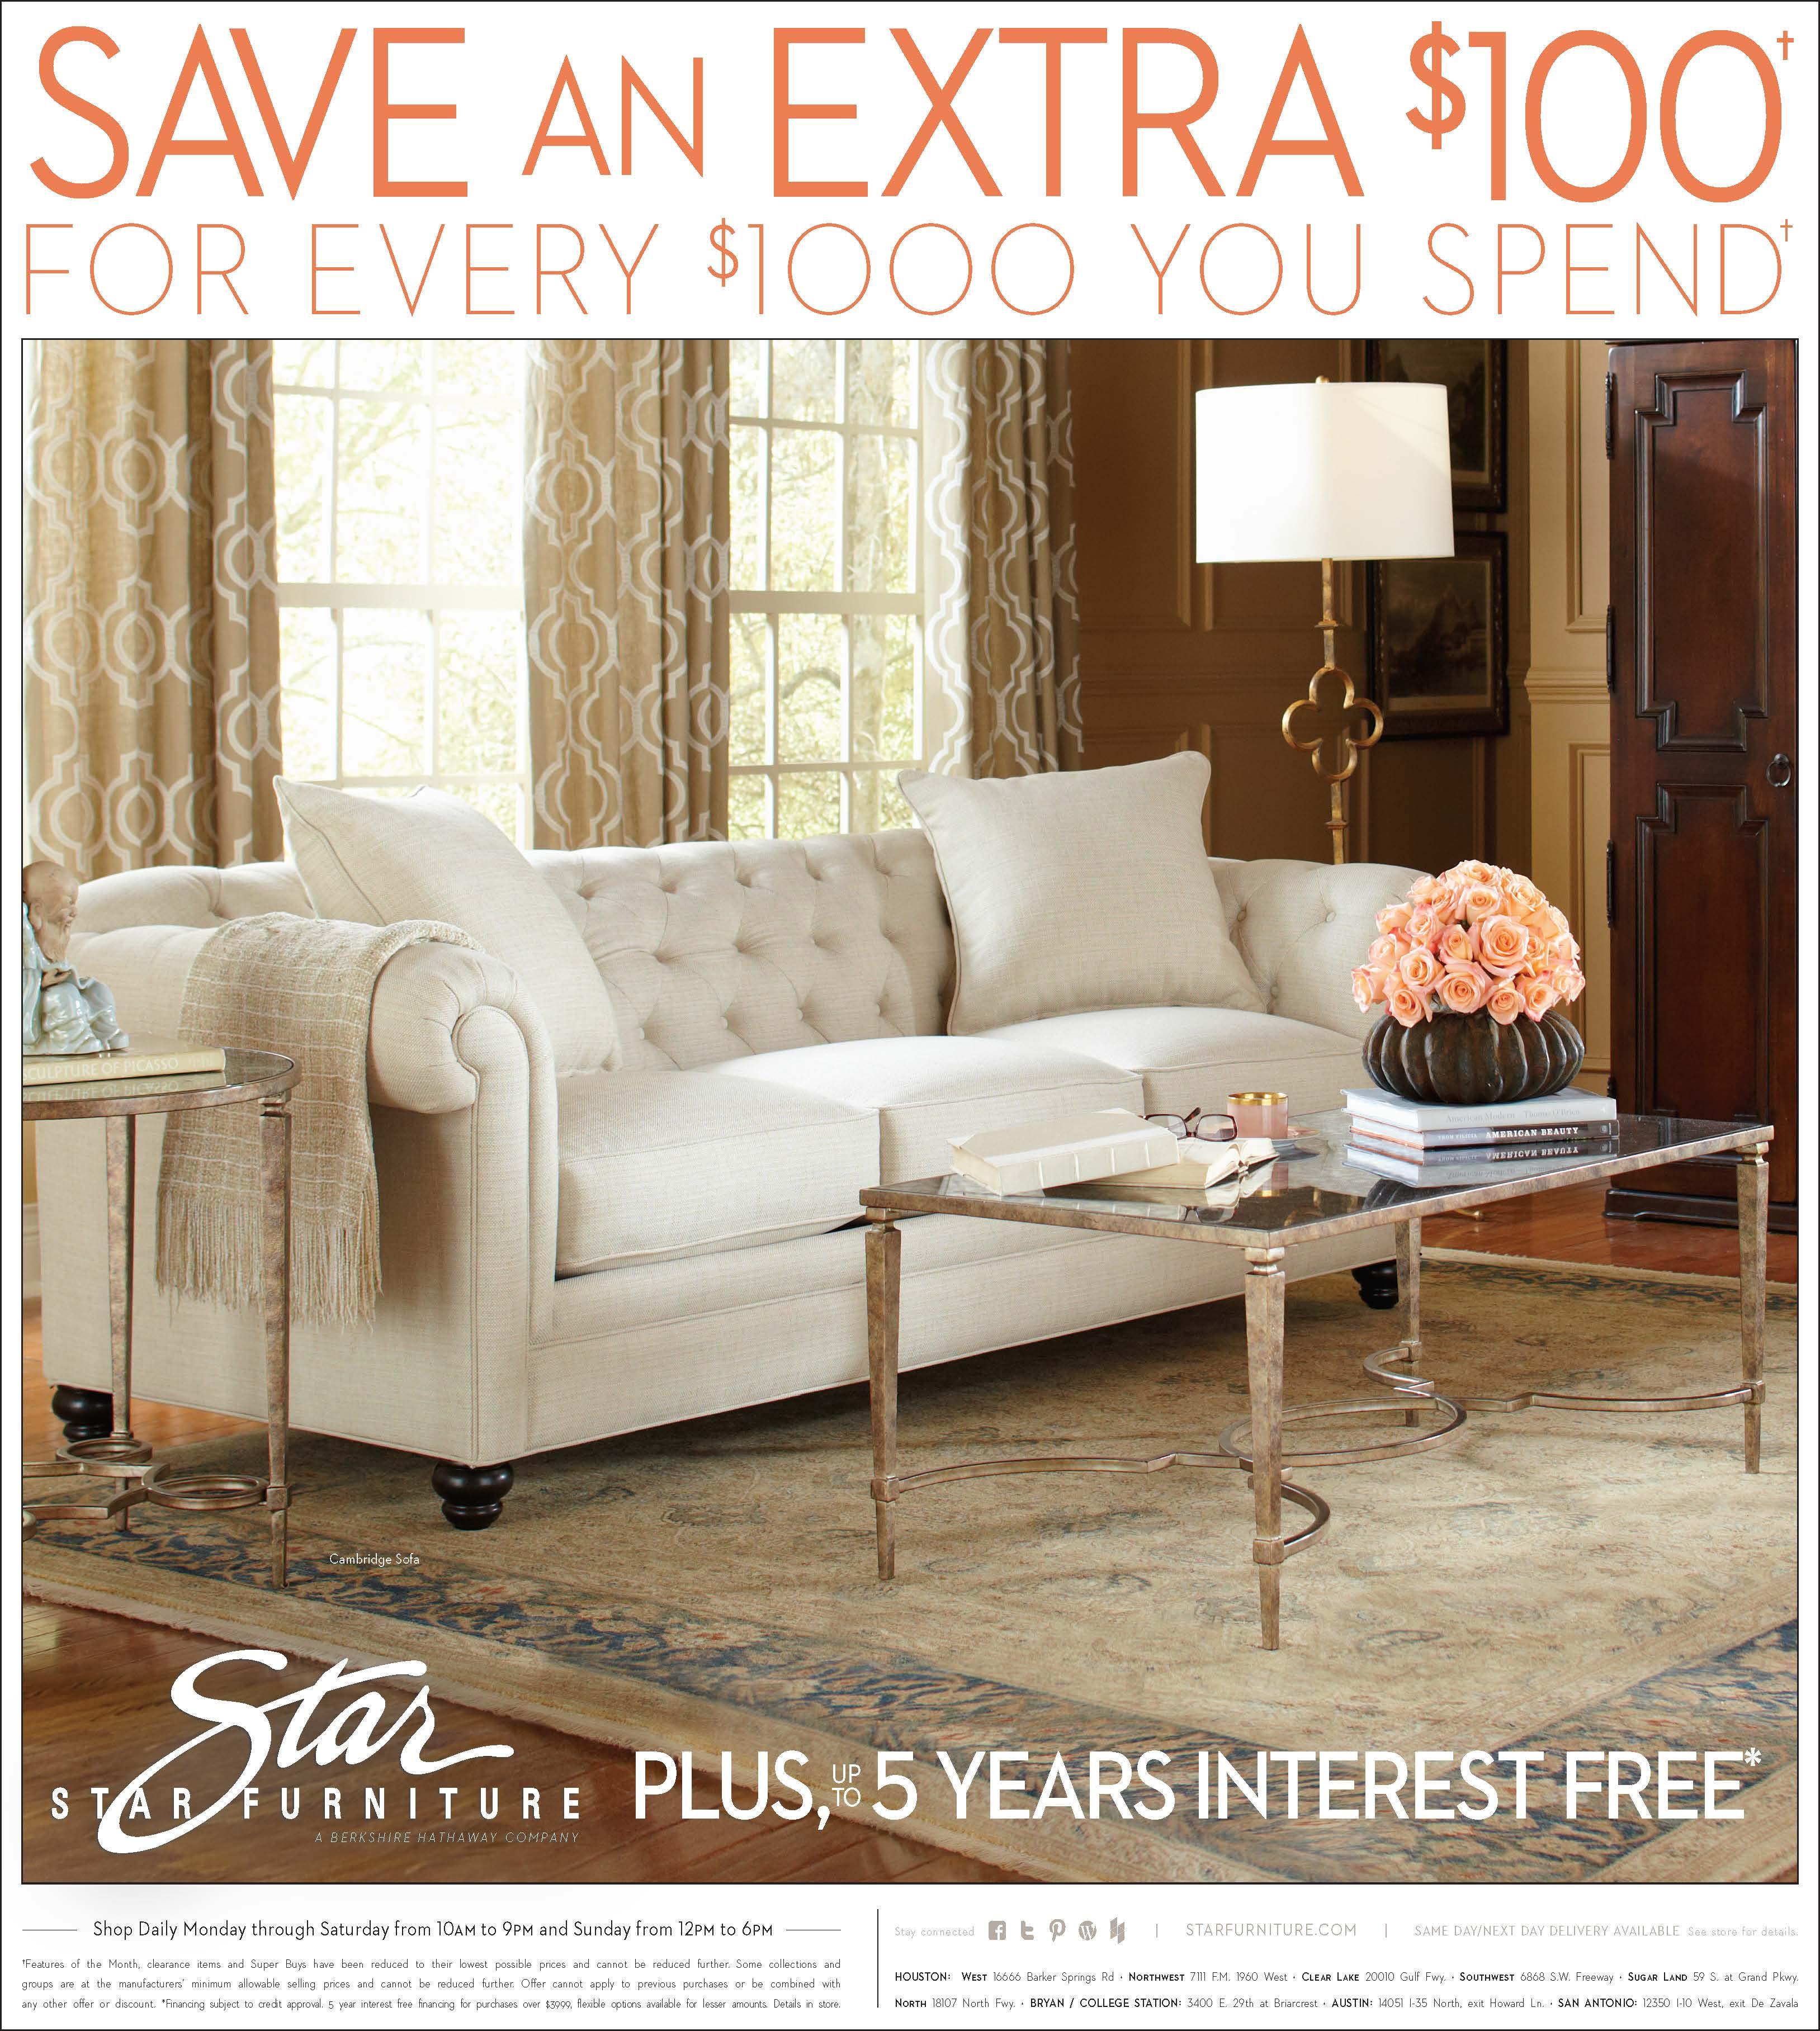 Extar $100 Newspaper Ad